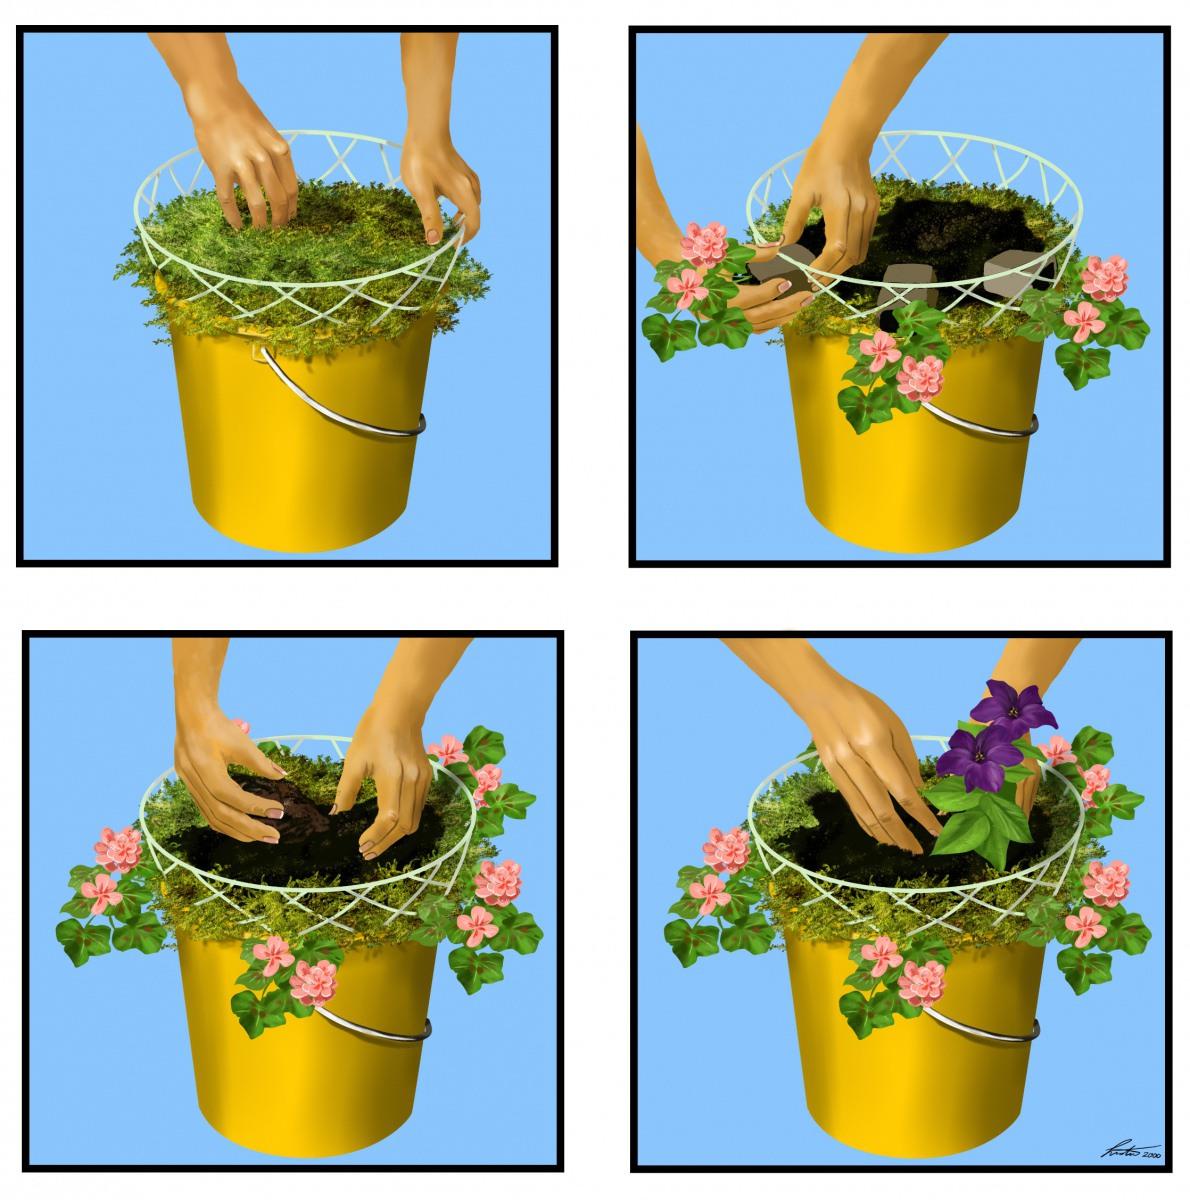 korbbepflanzen